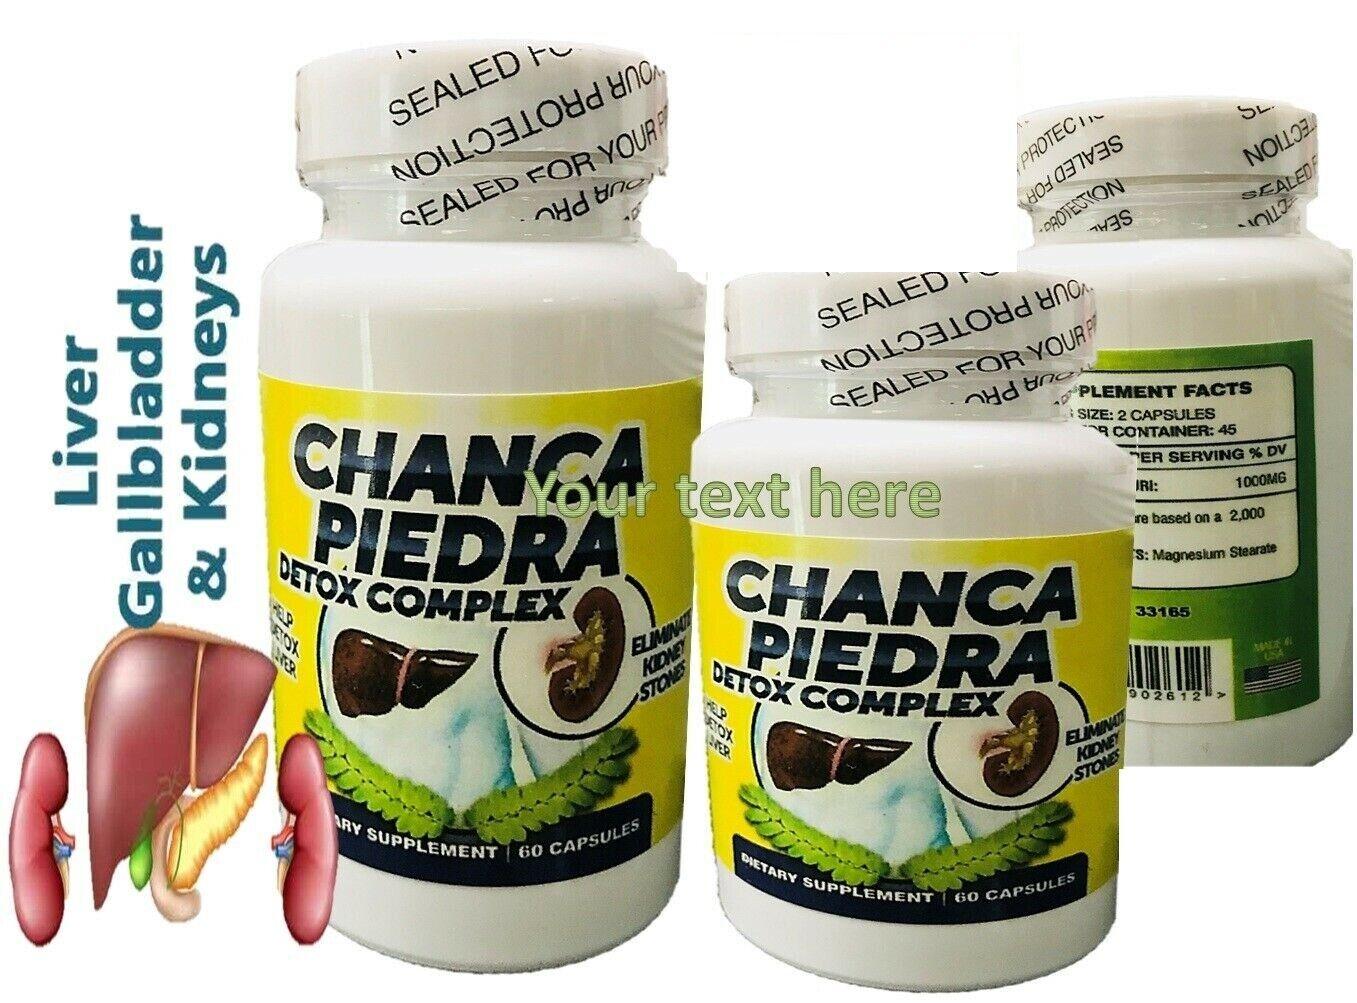 2 BOTTLES Chanca Piedra free BULK HERB organic natural potent QUEBRA PEDRA caps